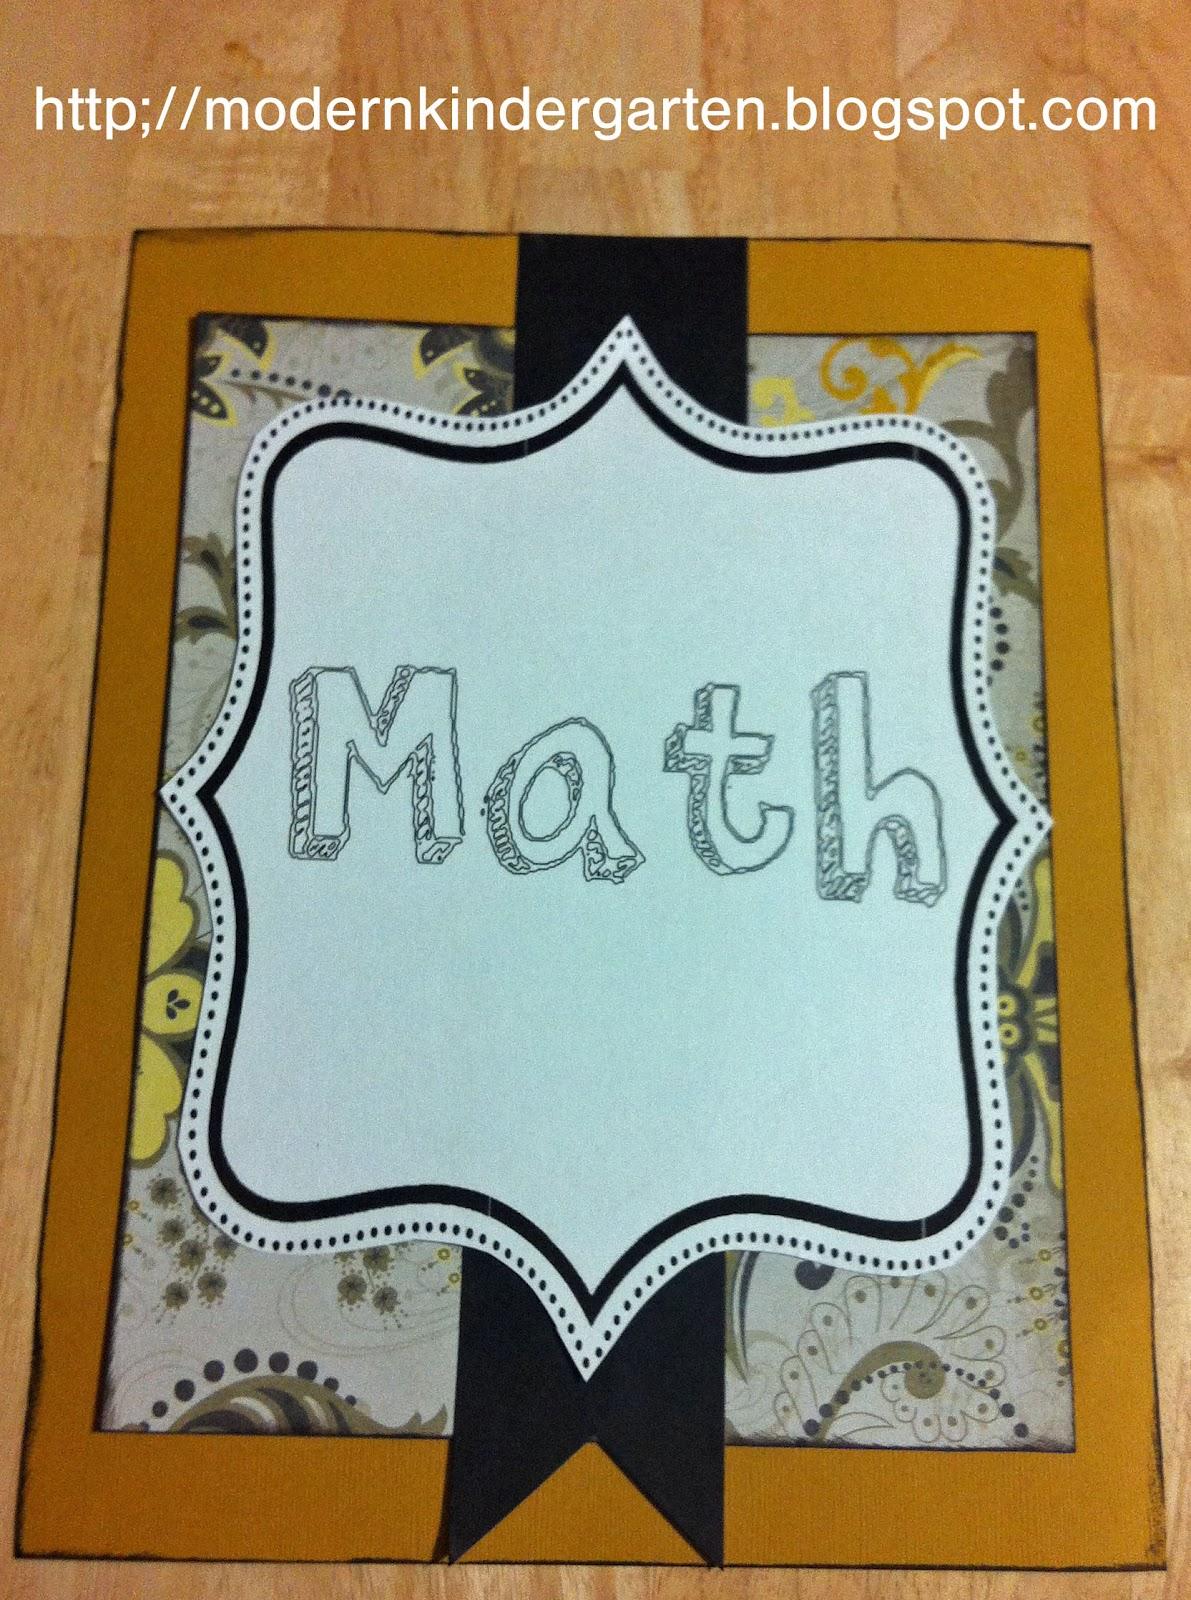 Modern Kindergarten: Organization: Binder Covers